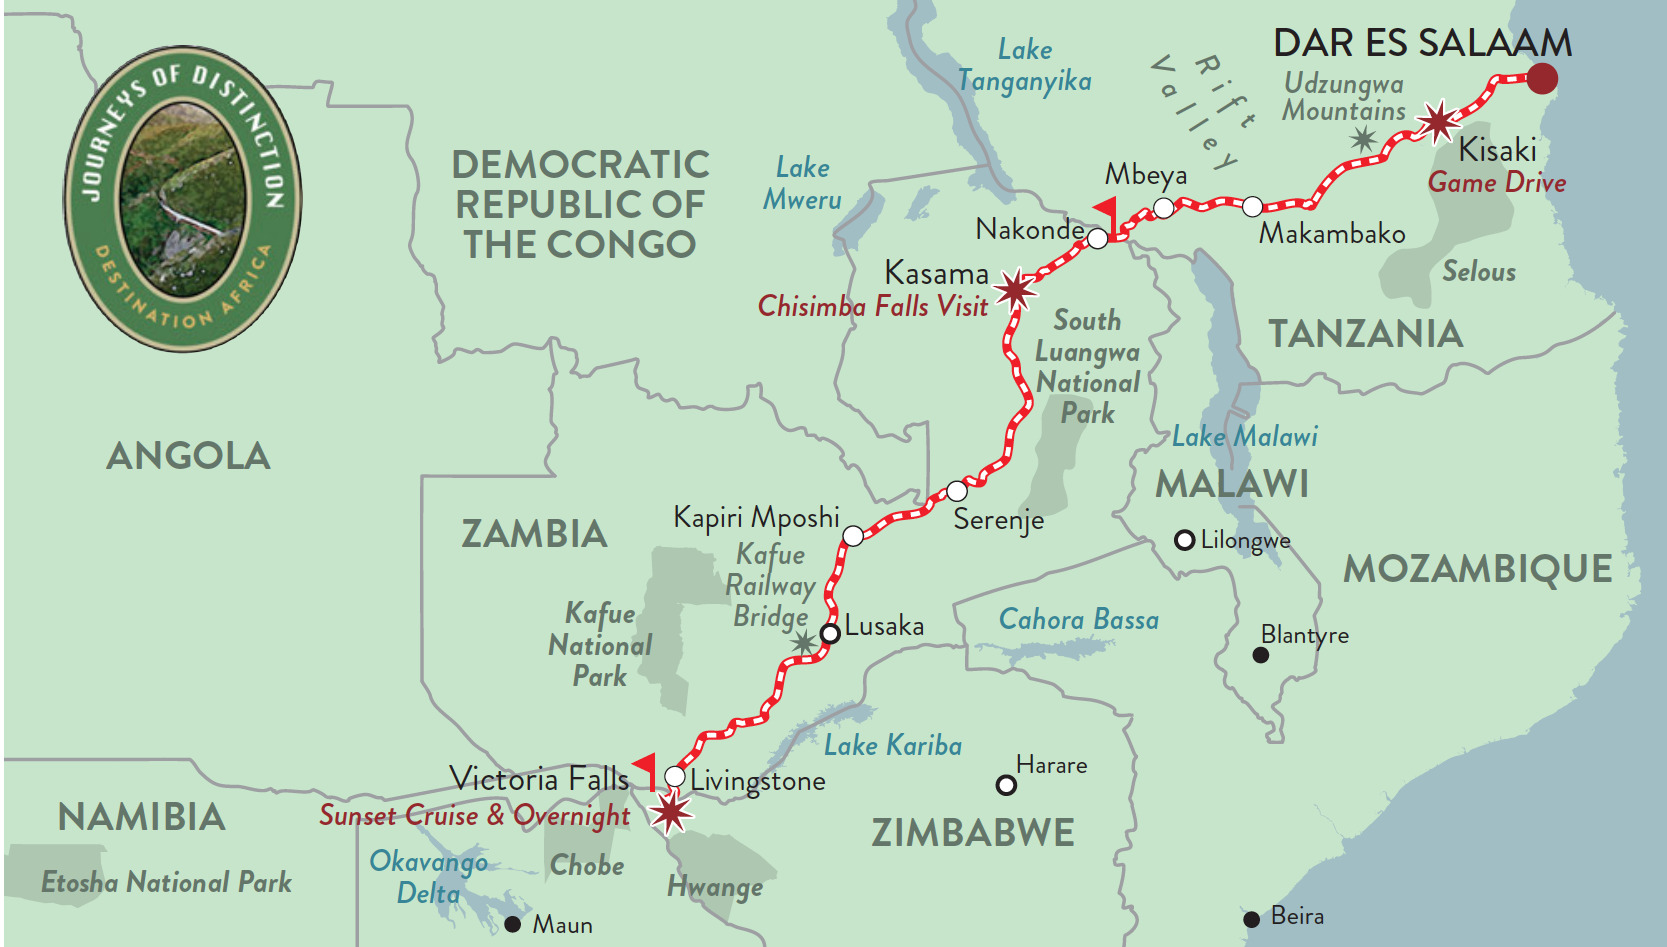 Route_Map_Vic_Falls_Dar_es_Salaam